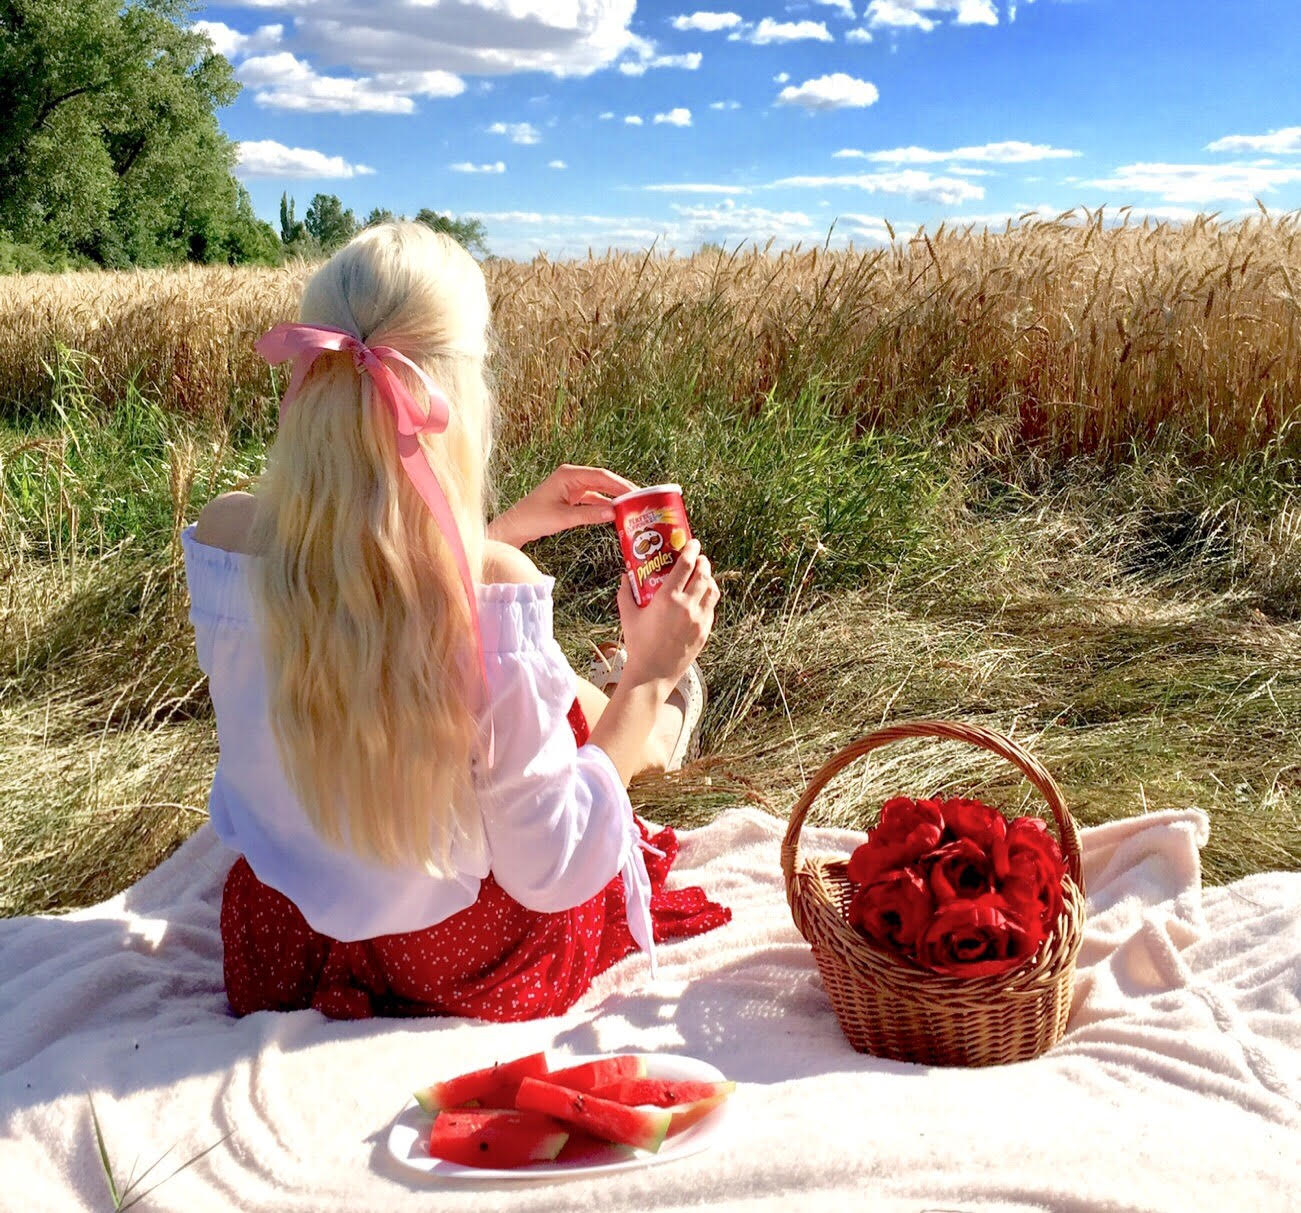 dezire piknik blog fashion castkovce